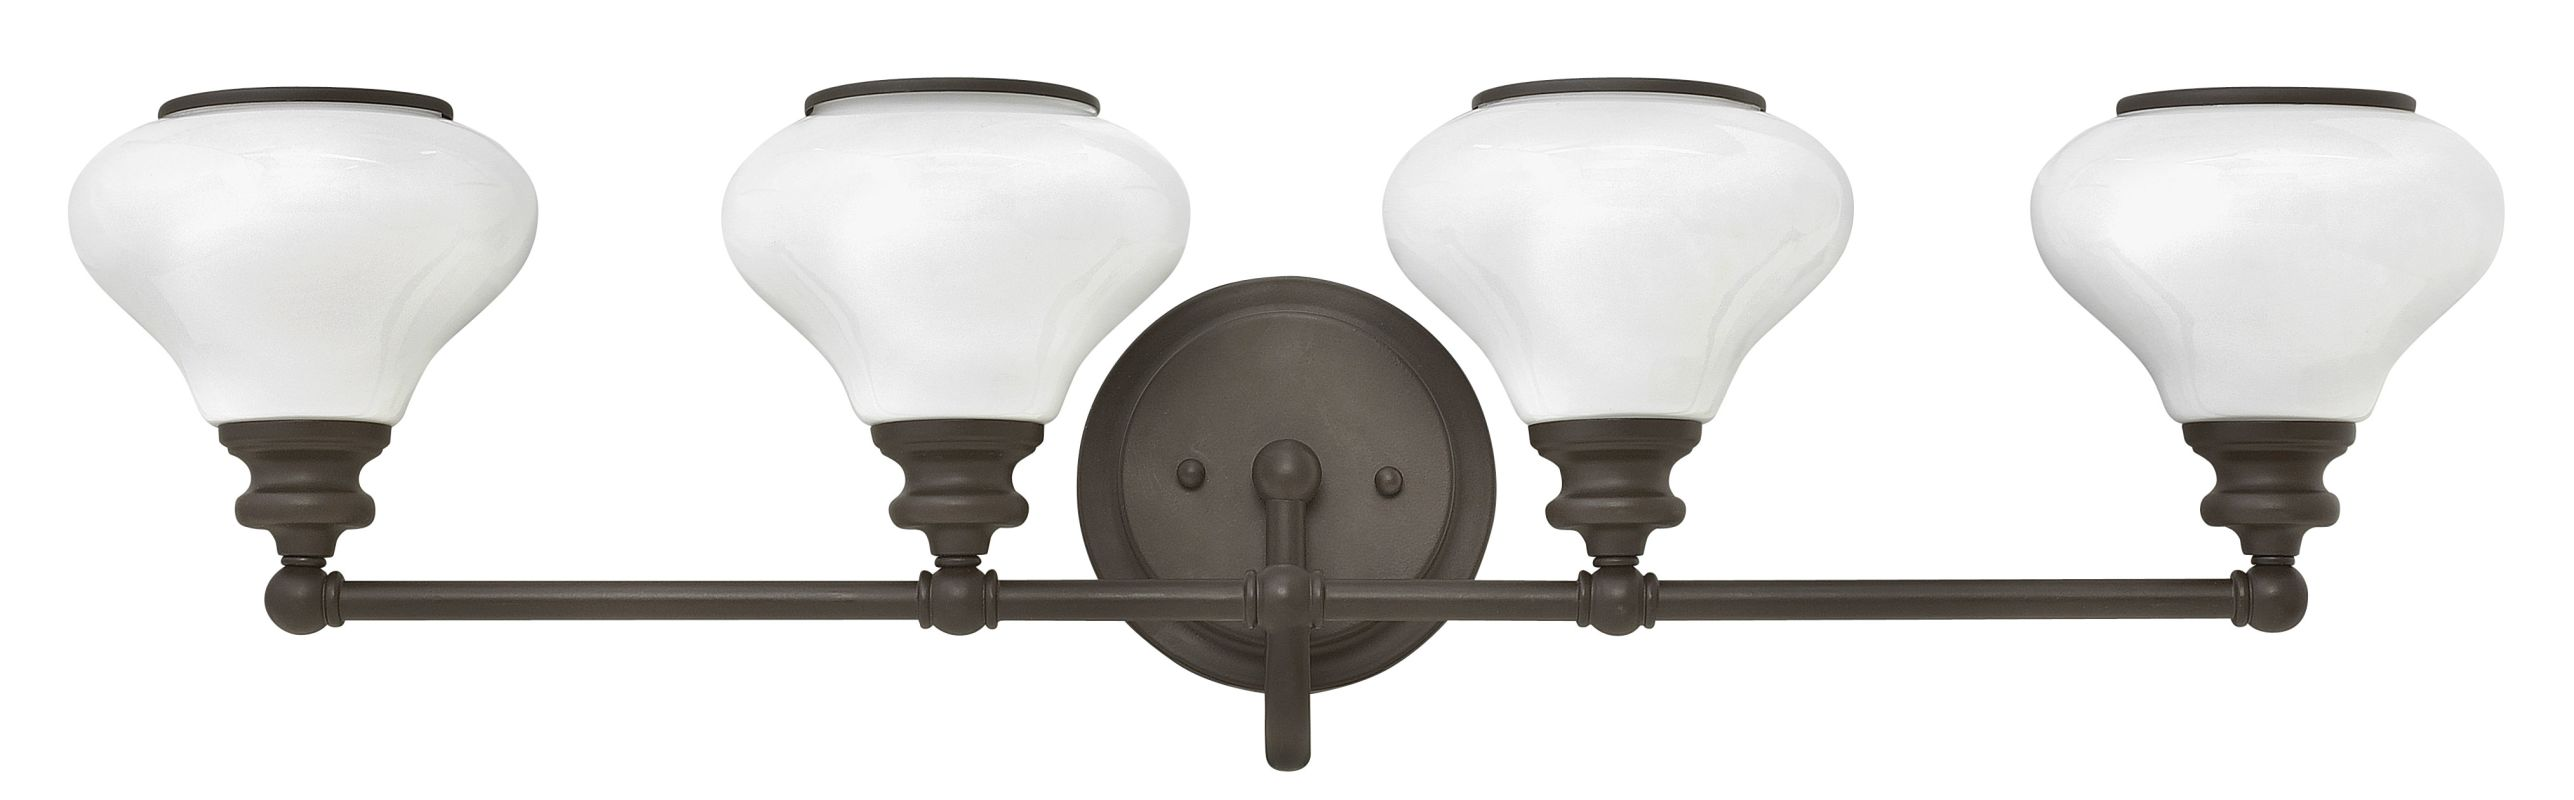 Hinkley Lighting 56554 4 Light Bathroom Vanity Light with Frosted